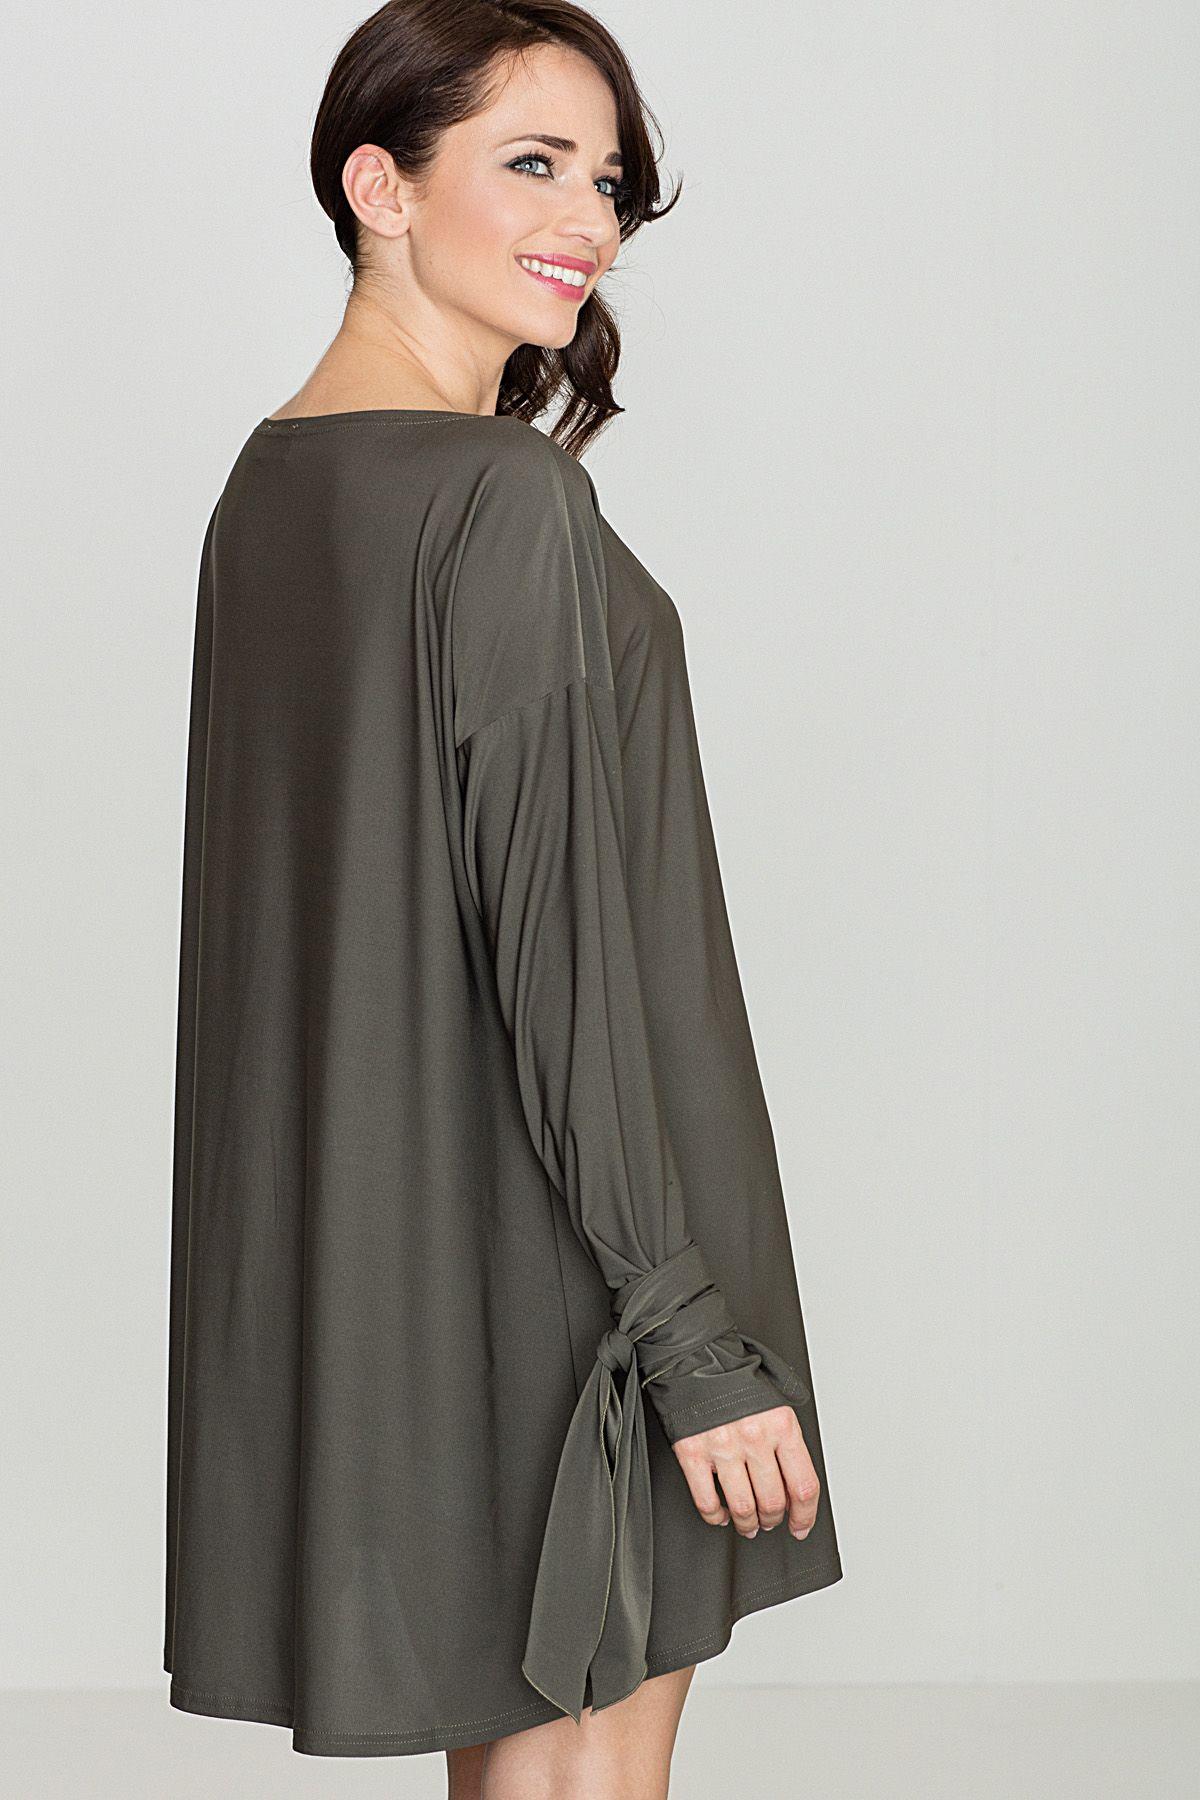 Long-Sleeved Tent Dress